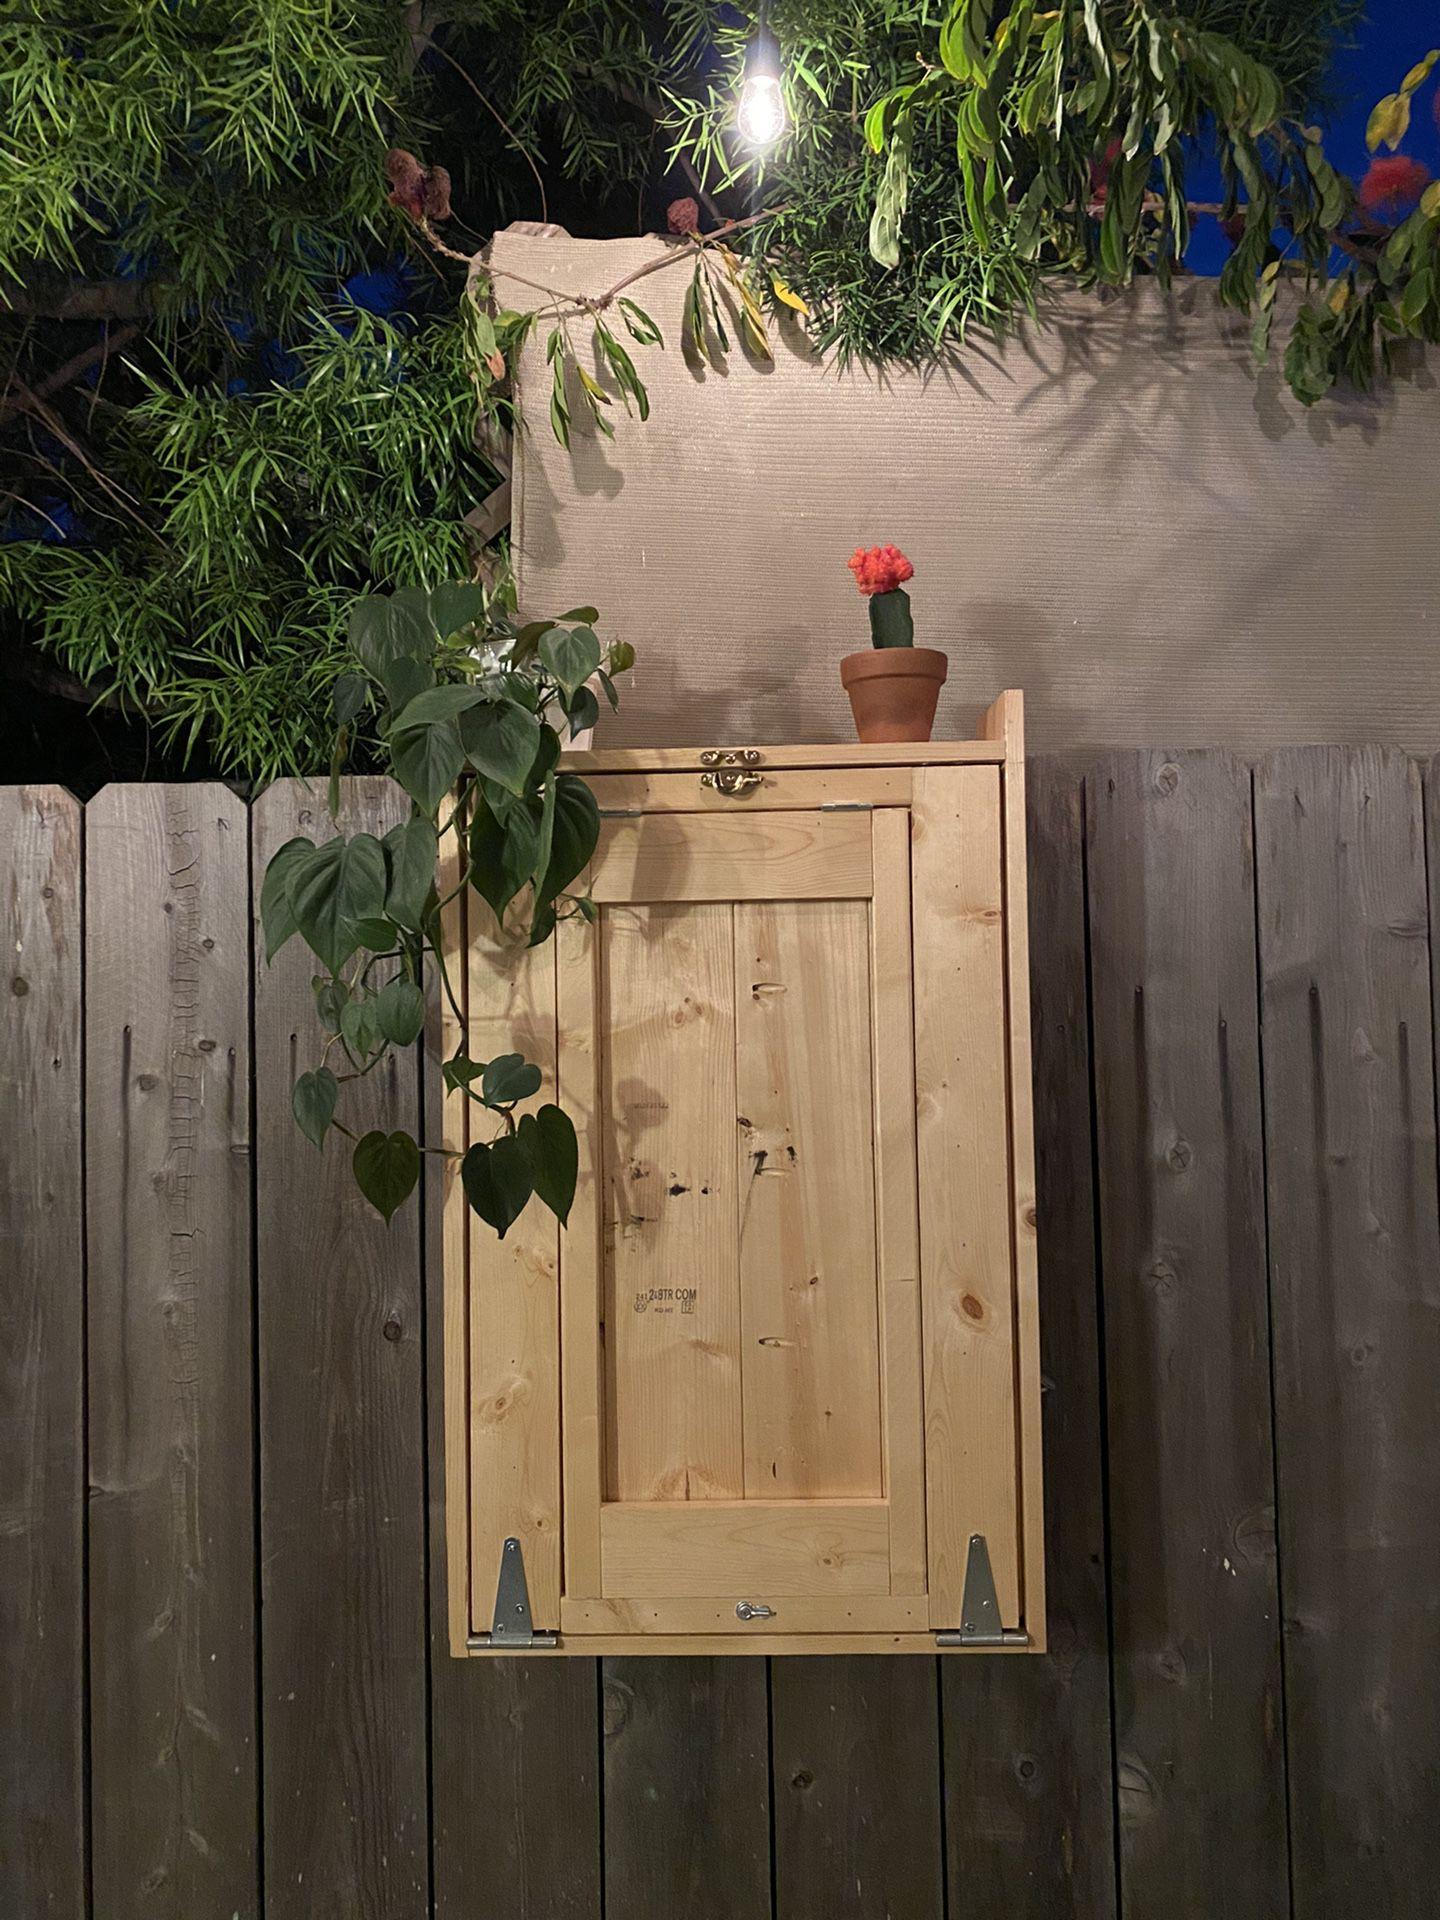 Backyard Murphy Bar: Built-to-order